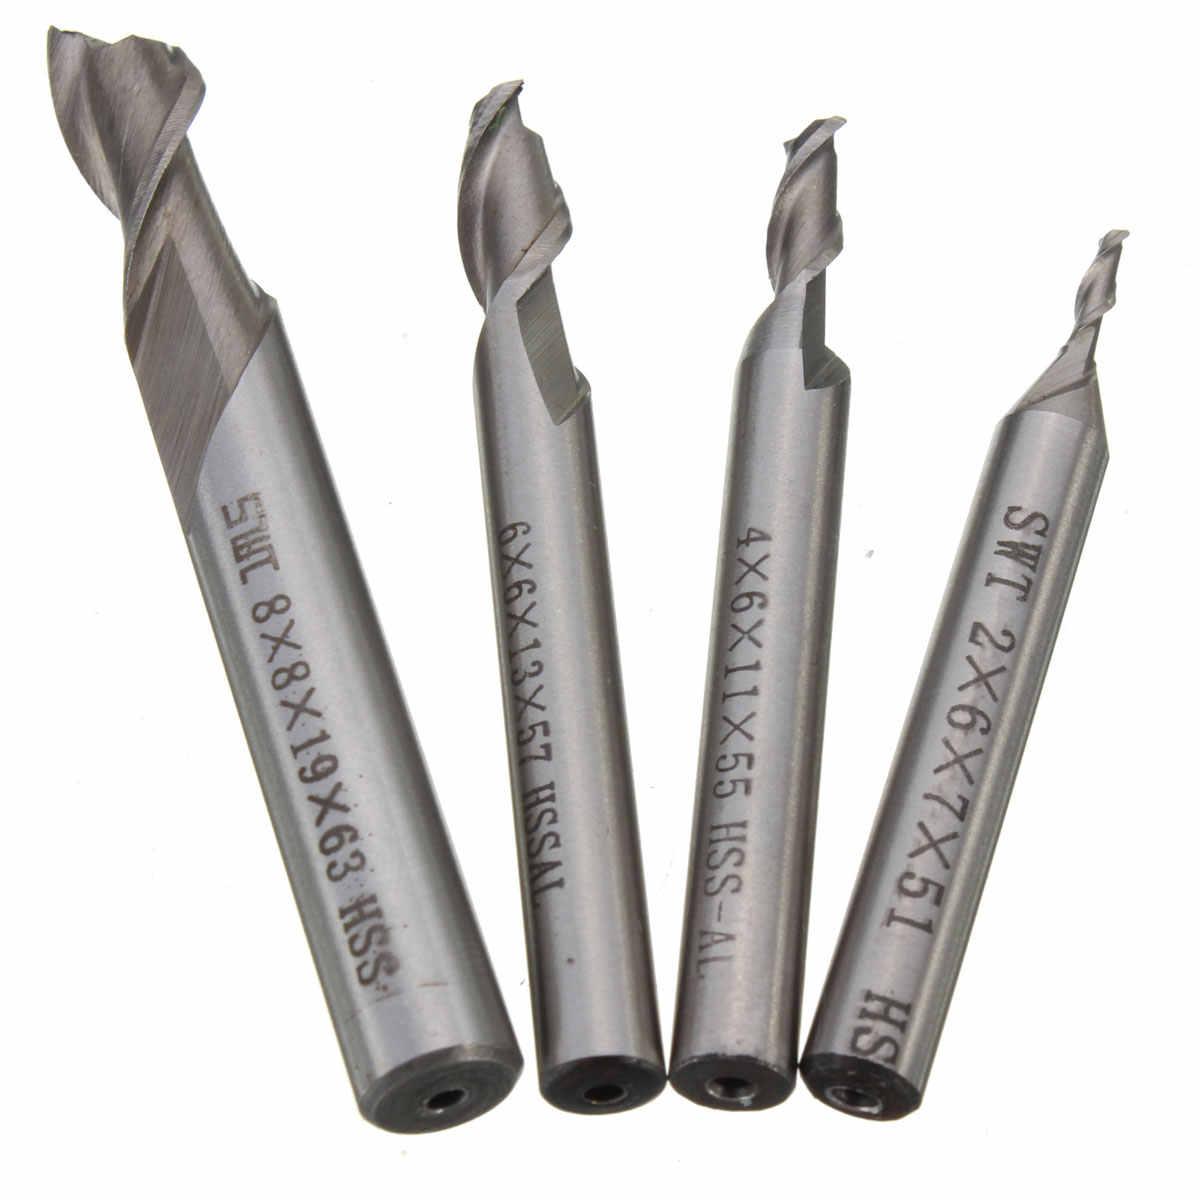 1PC 2 חליל HSS & אלומיניום סוף כרסום חותך CNC קצת 2mm-8mm מילס חריטת כלים הטוב ביותר קידום